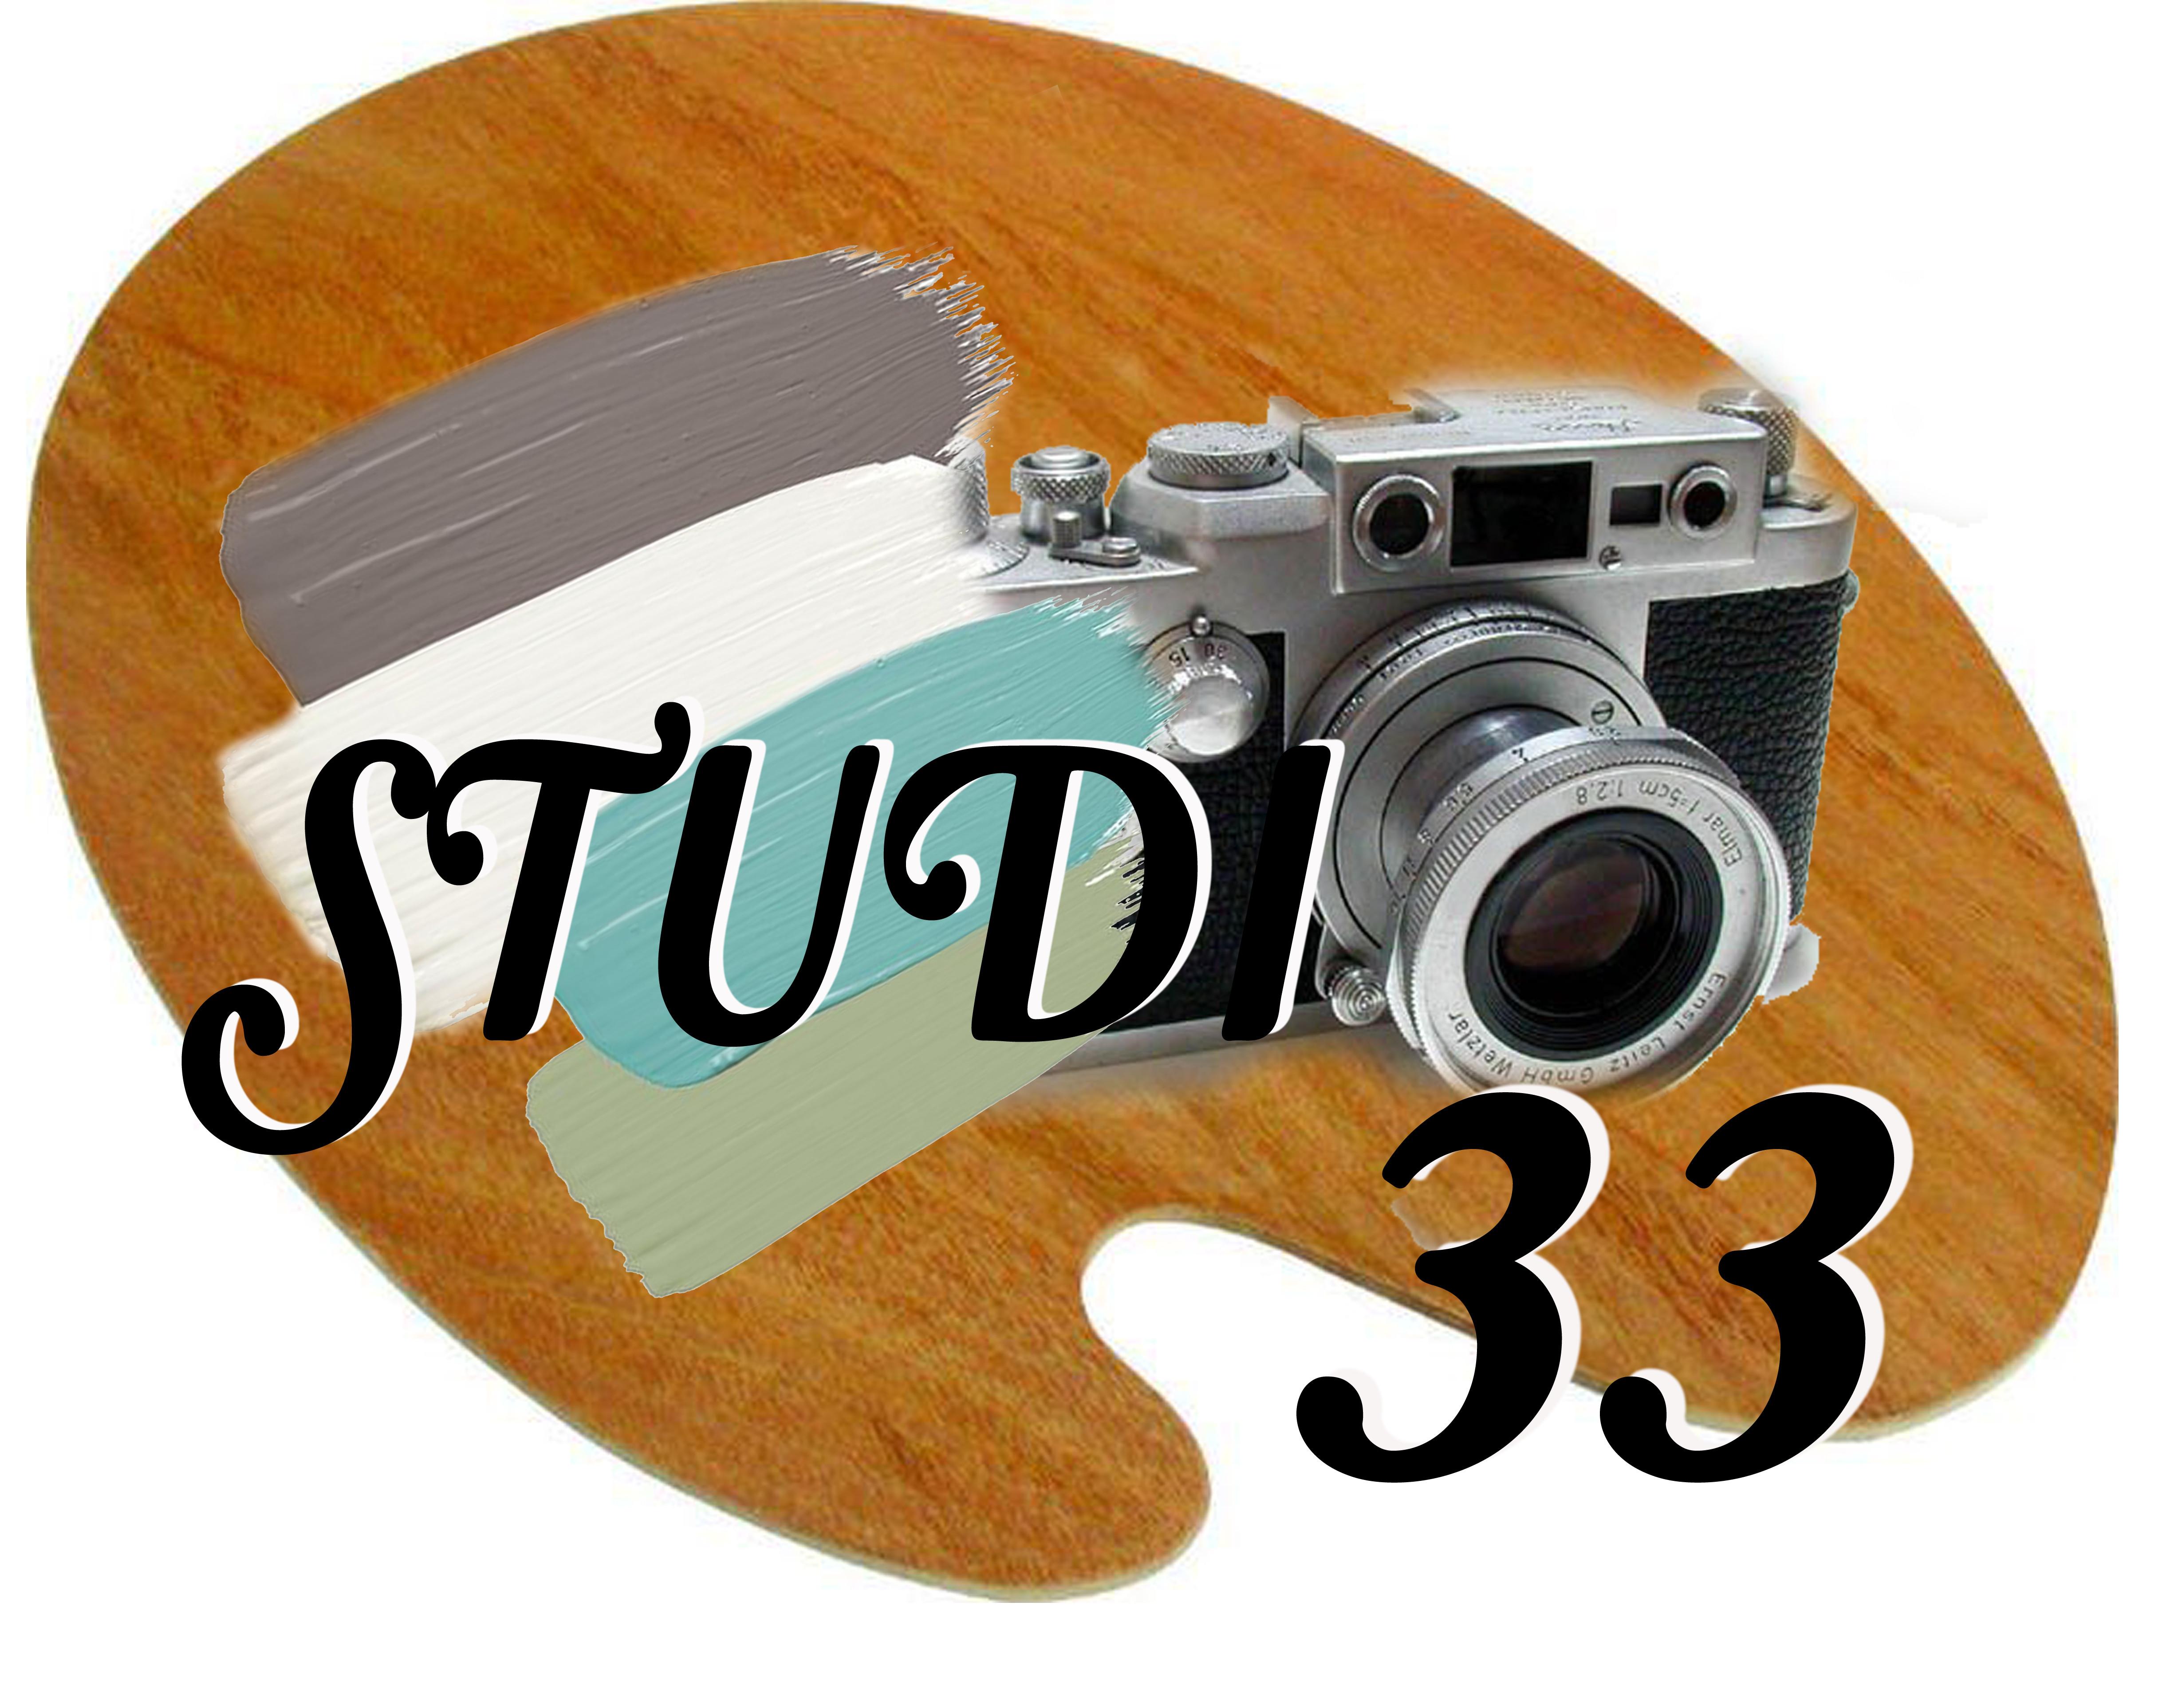 Studio 33 Rental Space